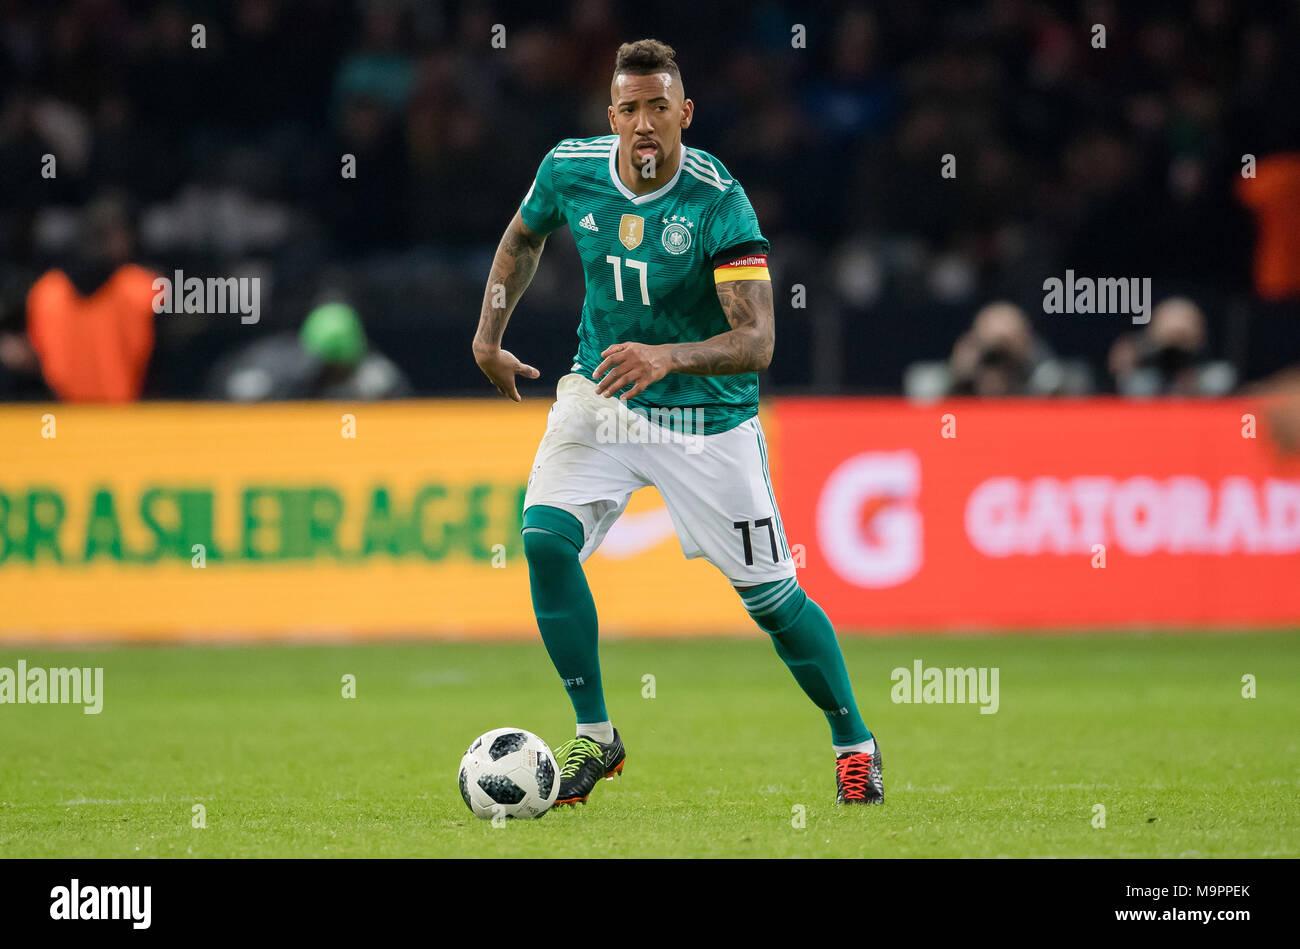 Jerome Boateng (Germany) am Ball  GES/ Fussball/ Freundschaftsspiel: Germany - Brasilien, 27.03.2018  Football / Soccer: Friendly Match: Germany vs Brazil, Berlin, March 27, 2018  usage worldwide - Stock Image